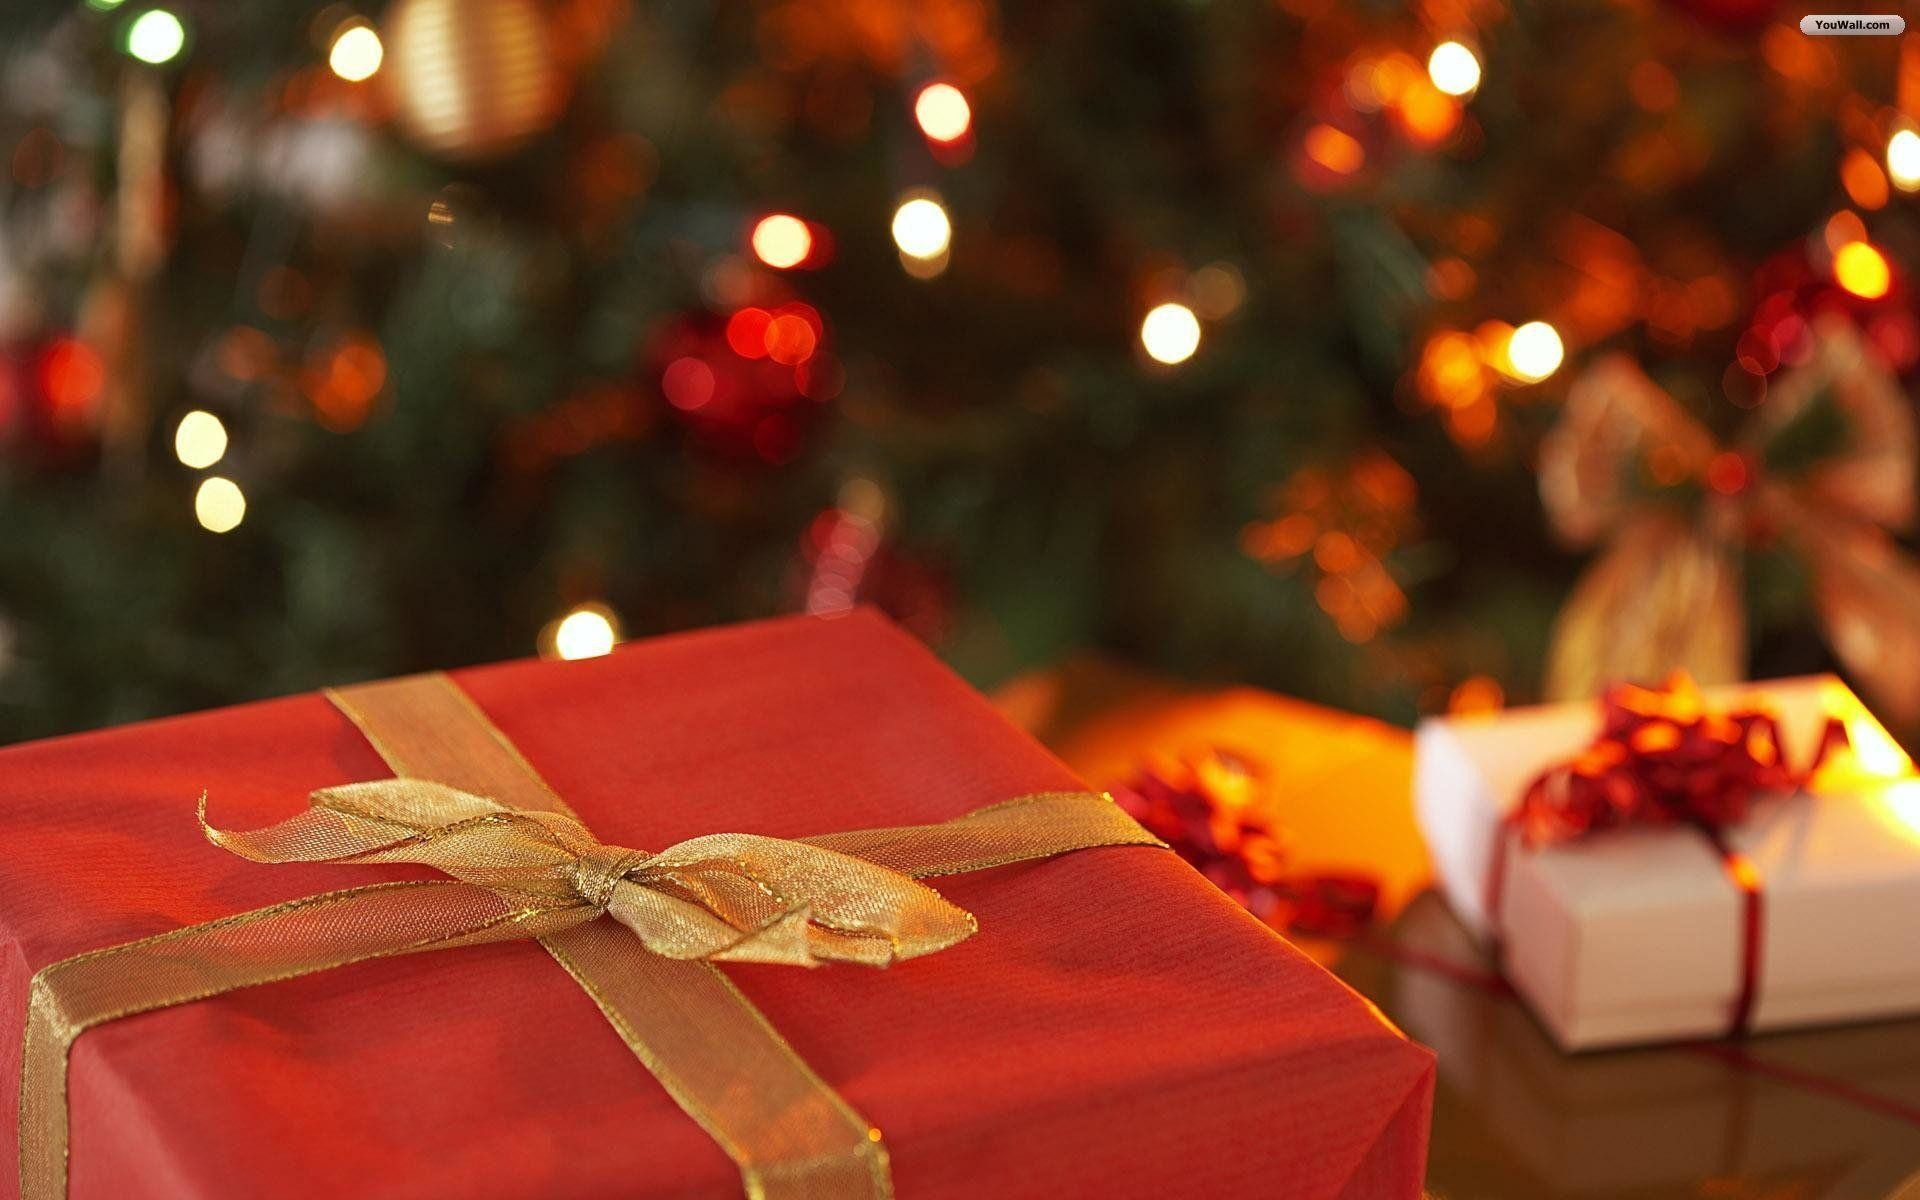 Res: 1920x1200, Christmas Presents Wallpaperchristmas Present Wallpaper Design .